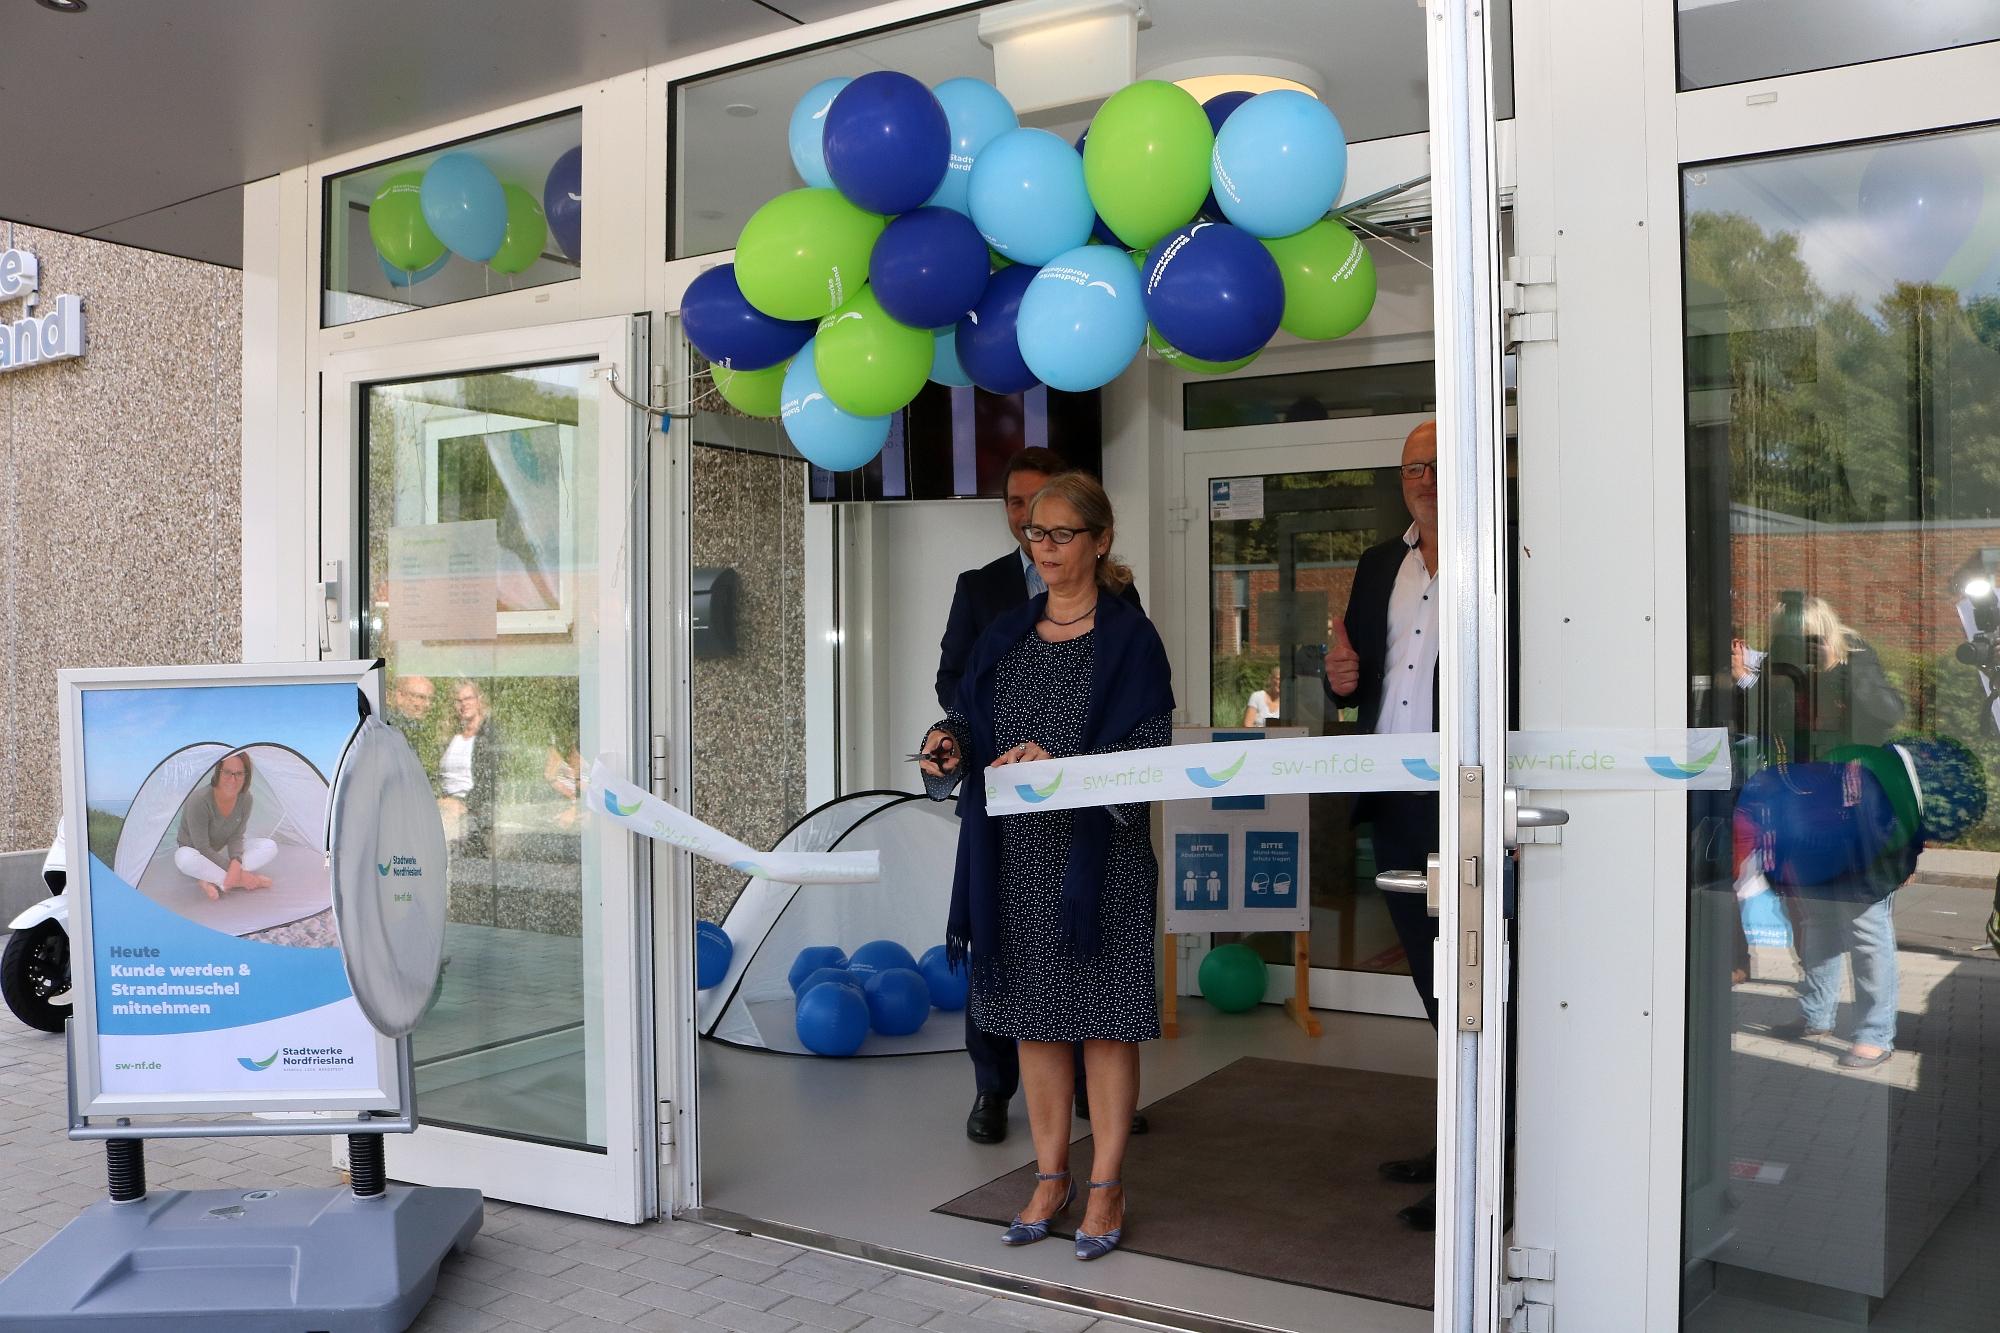 202009 Eröffnung Kundenbüro SWNF 7